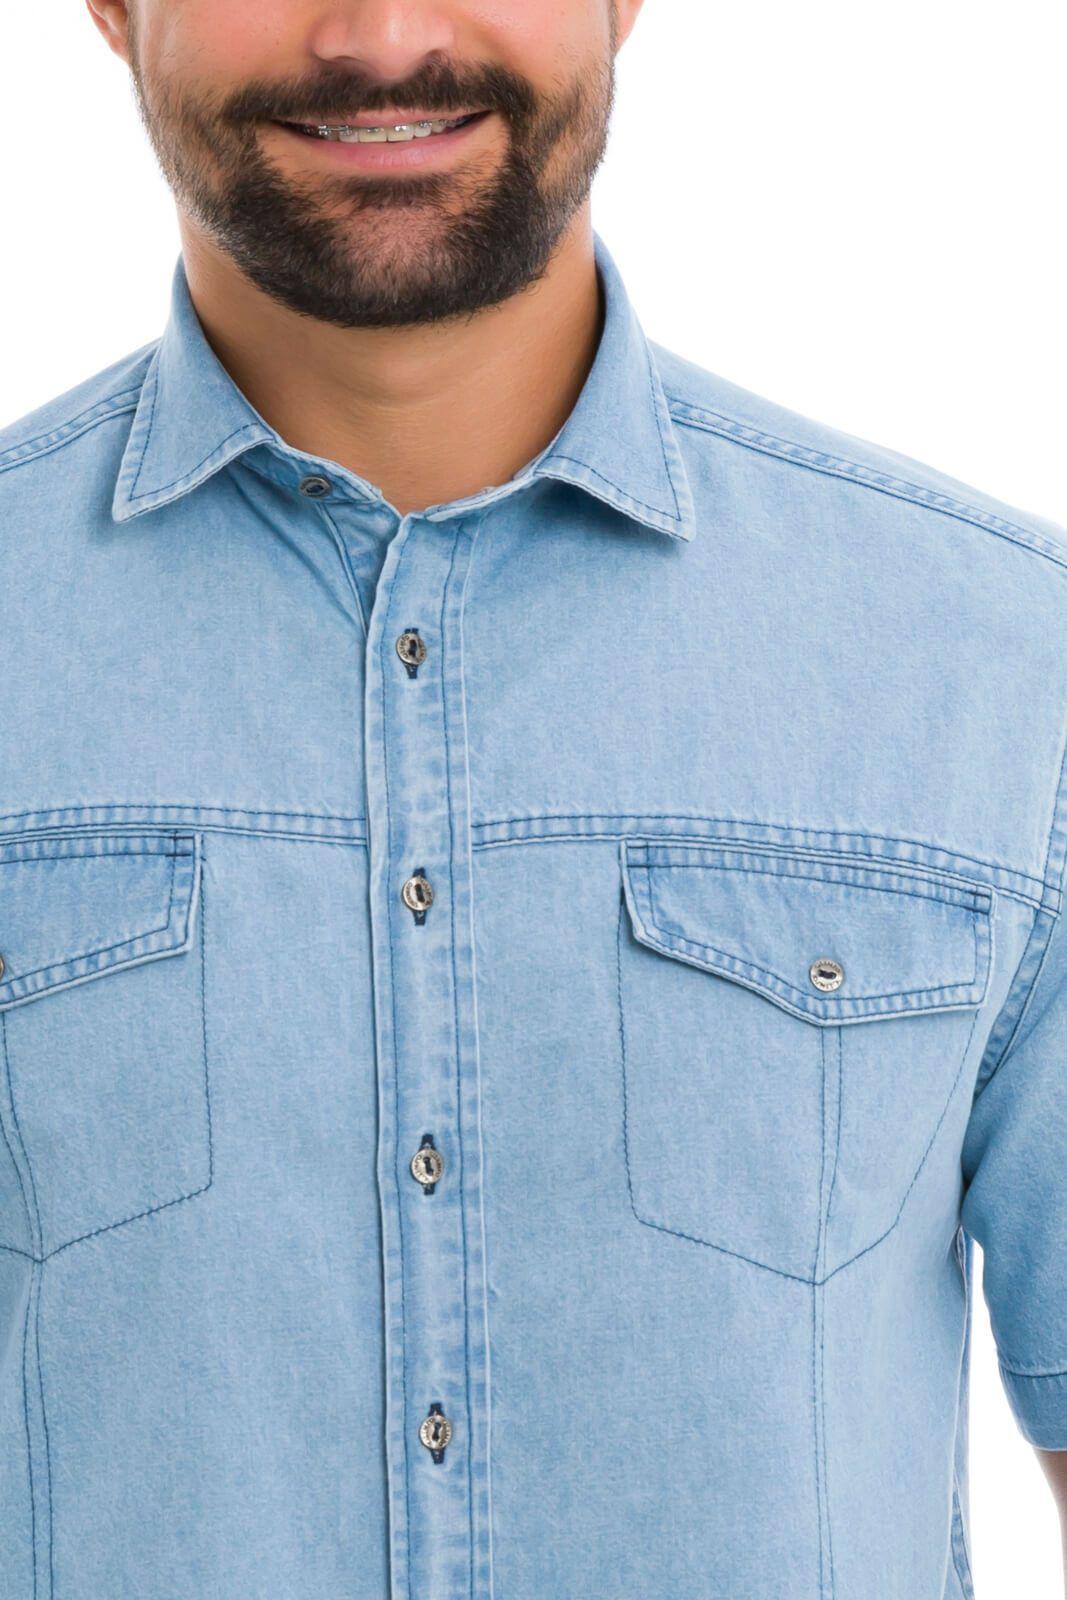 Camisa Social Jeans Slim Olimpo com Bolsos Manga Curta